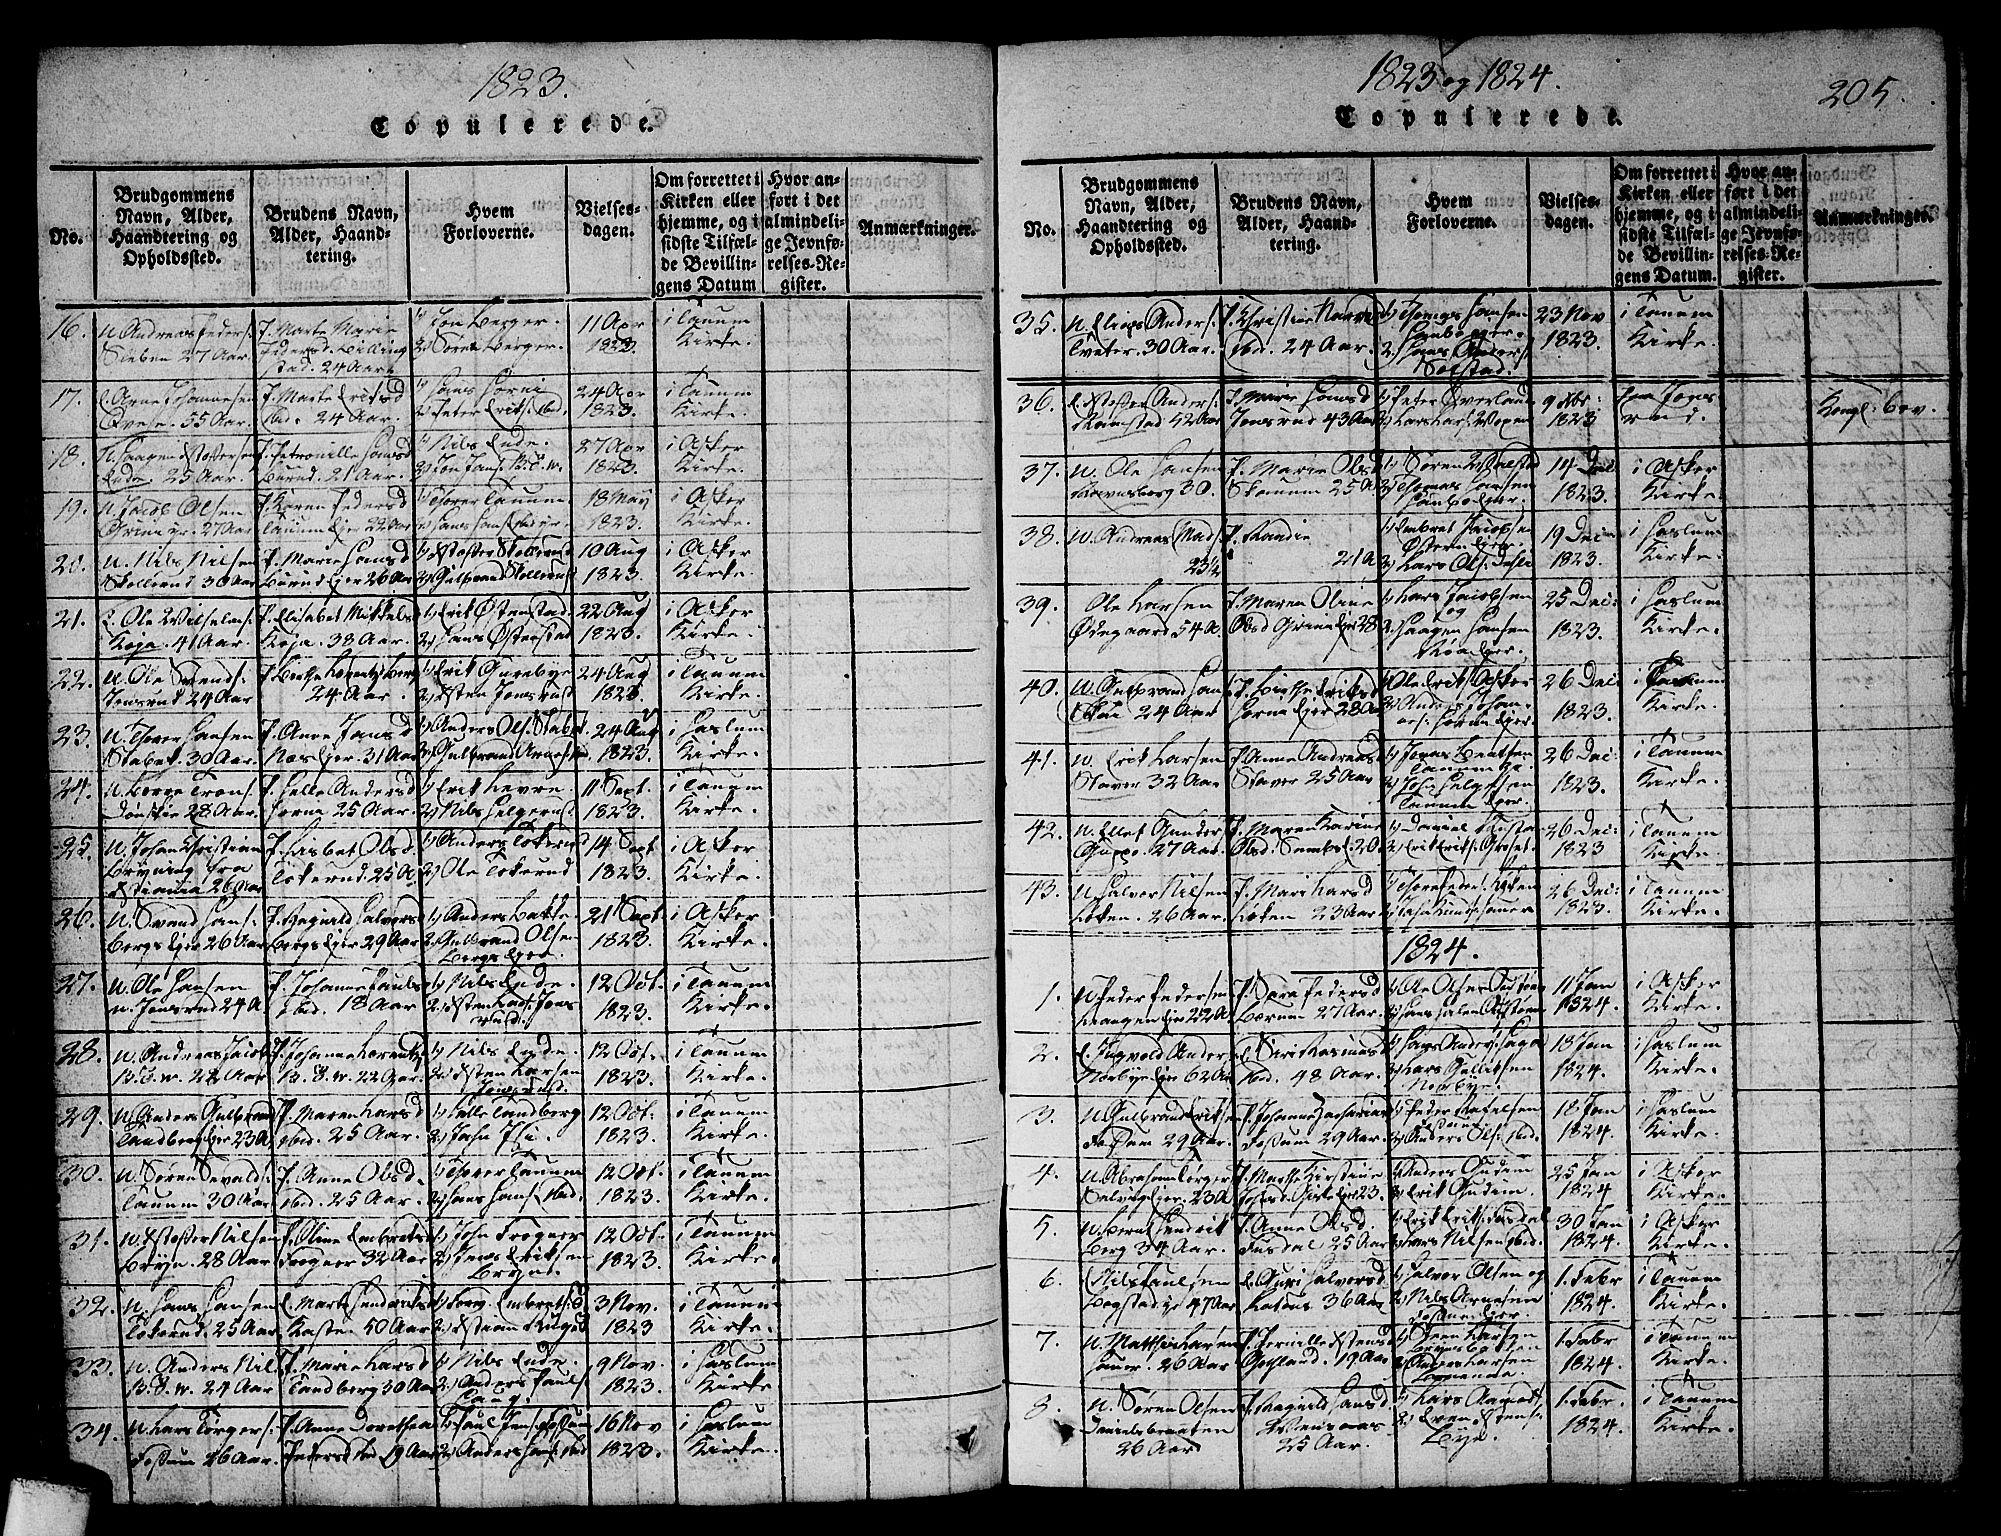 SAO, Asker prestekontor Kirkebøker, G/Ga/L0001: Klokkerbok nr. I 1, 1814-1830, s. 205